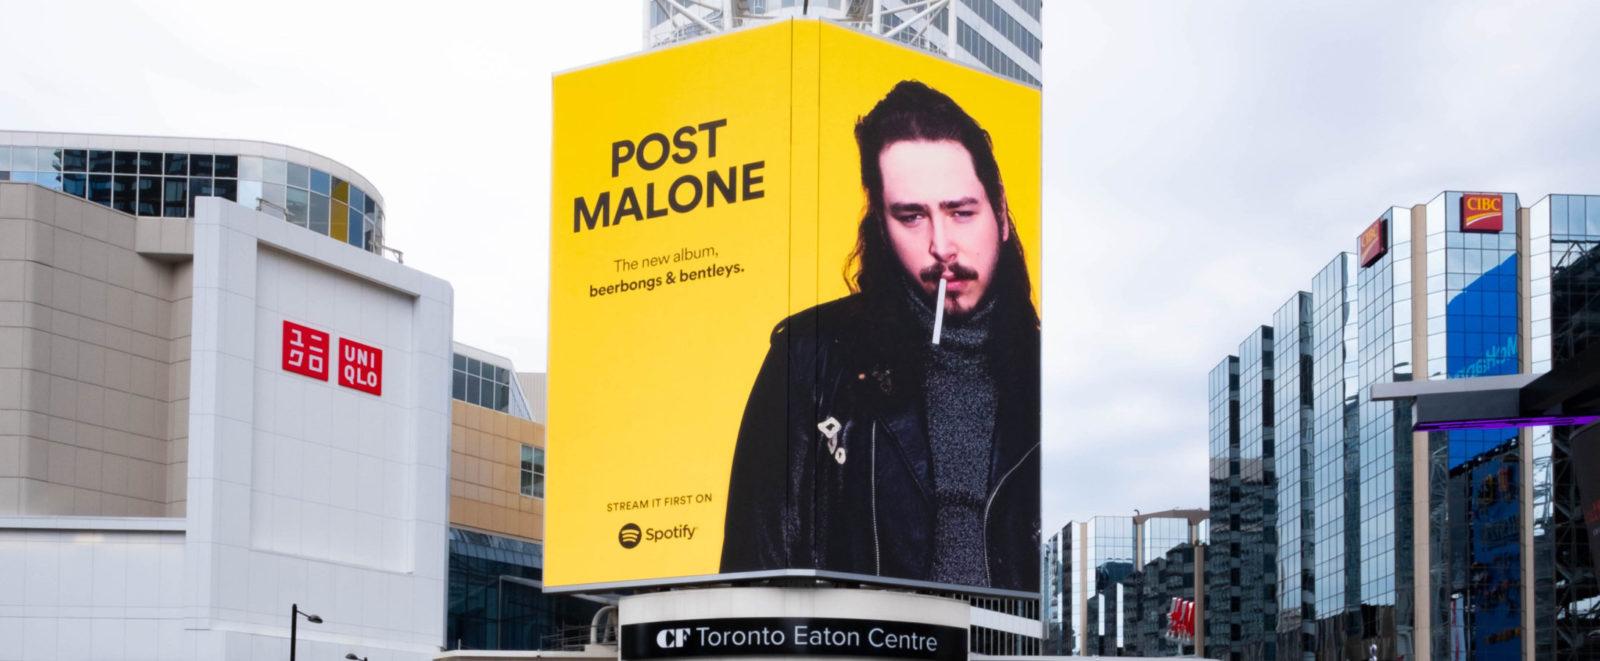 Spotify Post Malone - Yonge-Dundas Square - CF TEC Tower + AOB Media Tower (Toronto, Ontario)